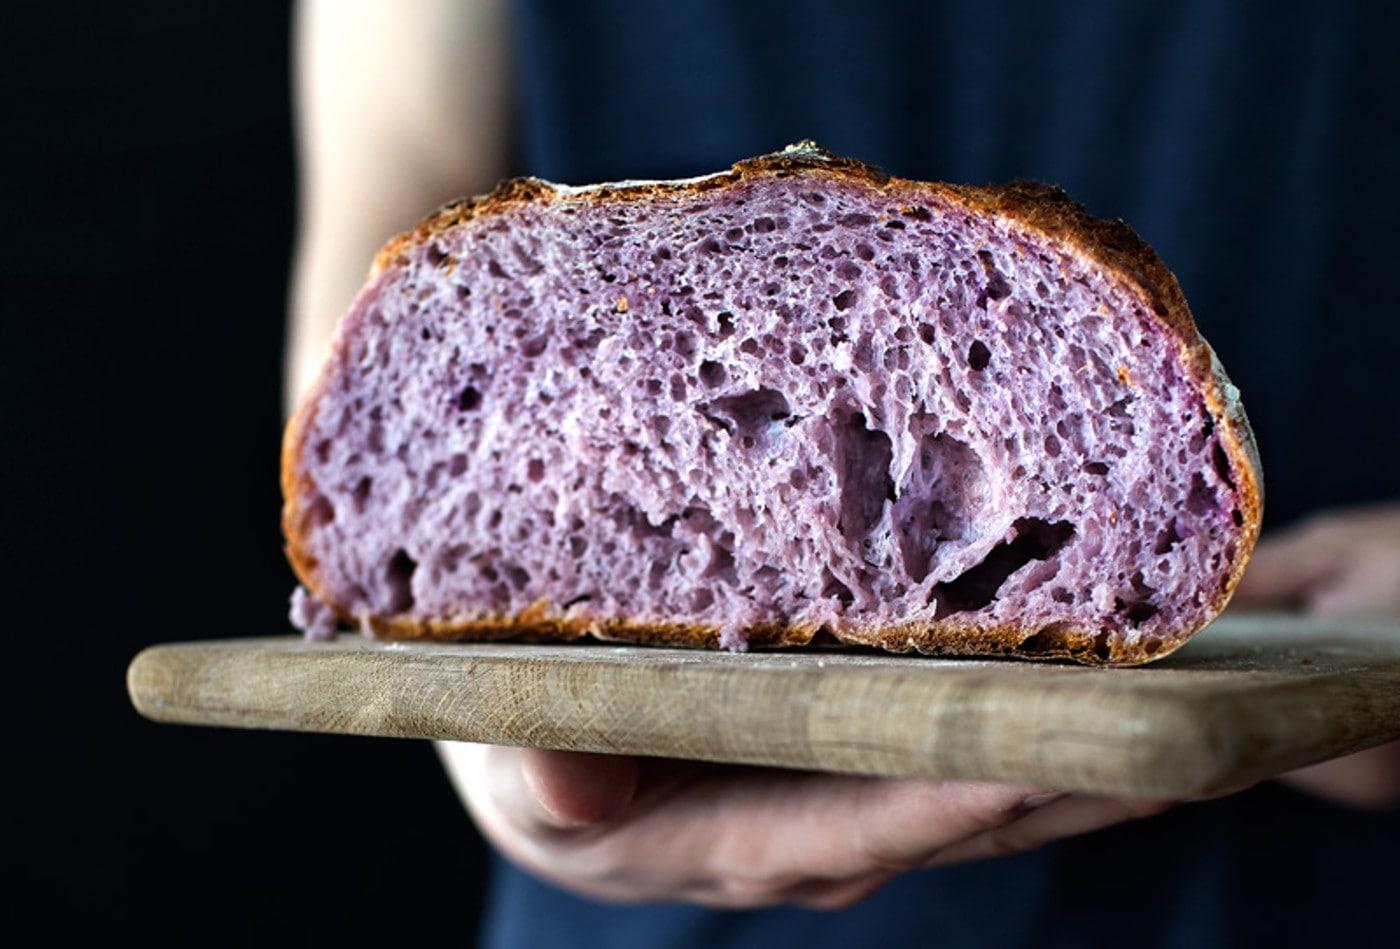 https://www.dotmug.net/wp-content/uploads/2017/10/25.-Pane-Viola-Purple-Bread-Antocianine-Superfood-Dotmug.jpg